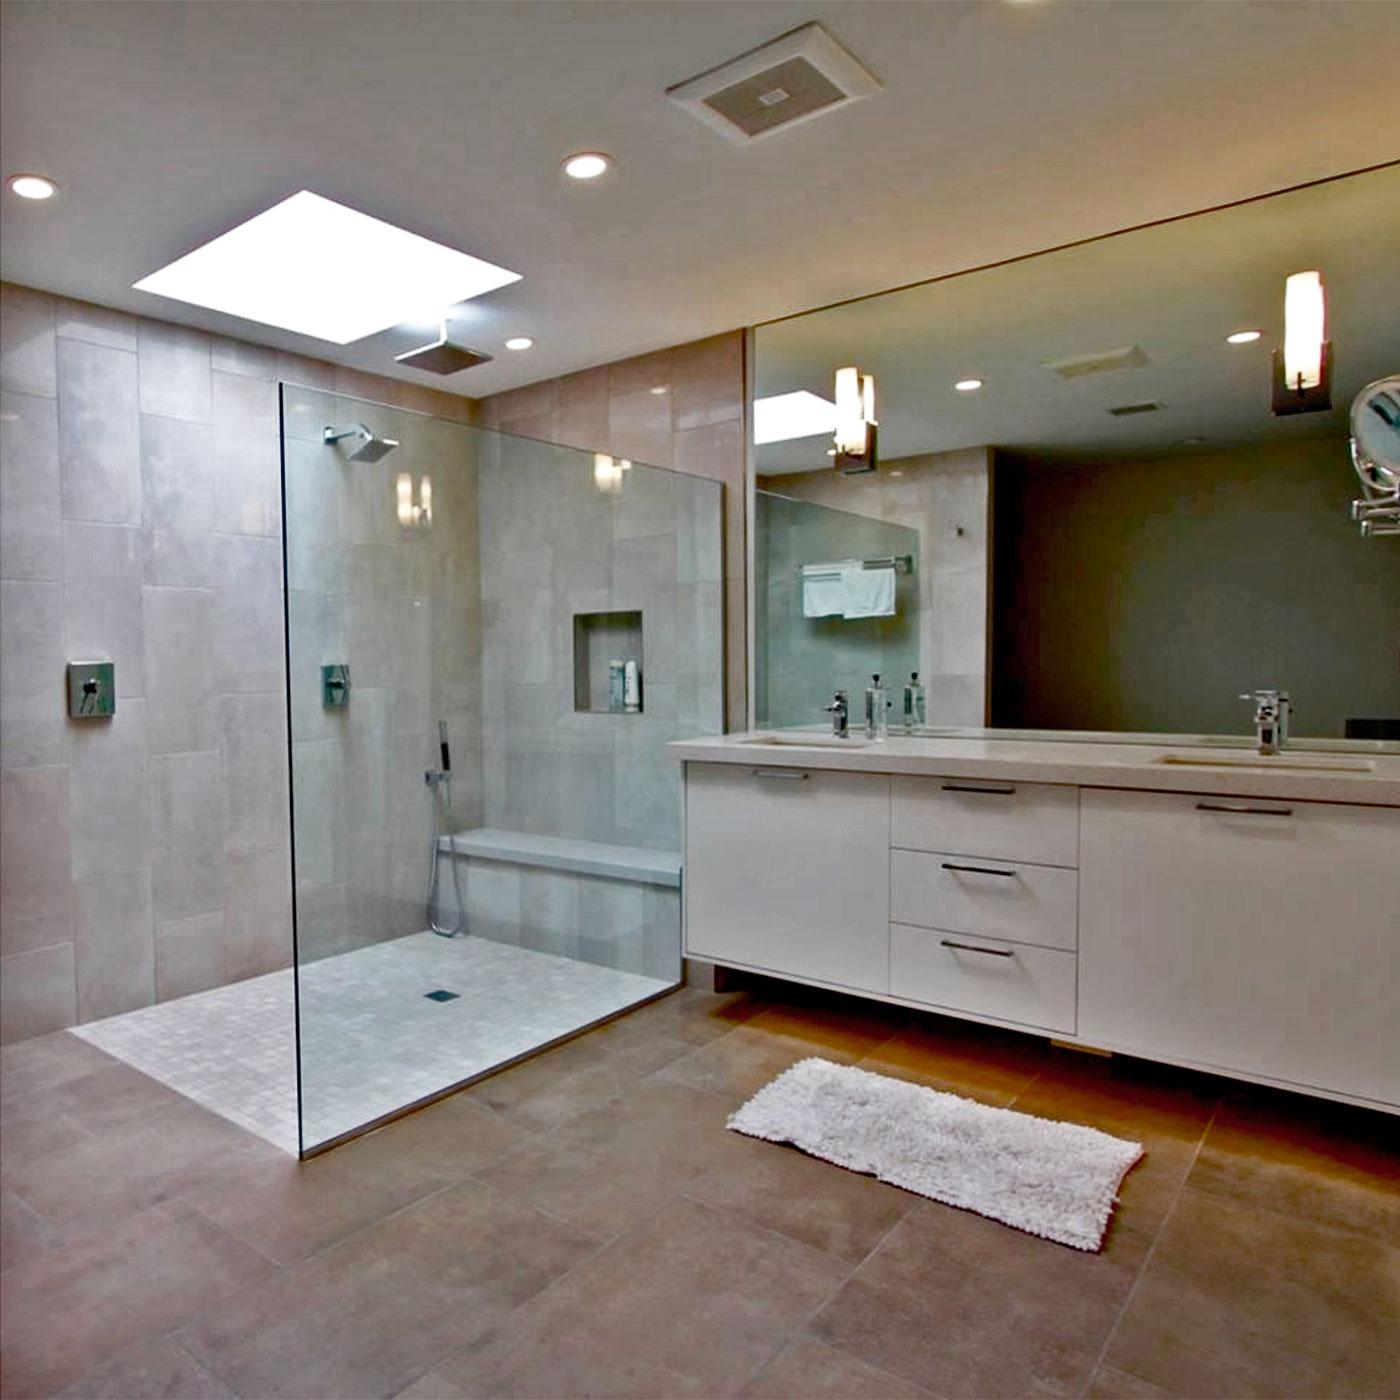 https://palmdesertbuilder.com/wp-content/uploads/2018/09/Palm-Springs-Kitchen-Bathroom-Remodel-Premier-1-med.jpg